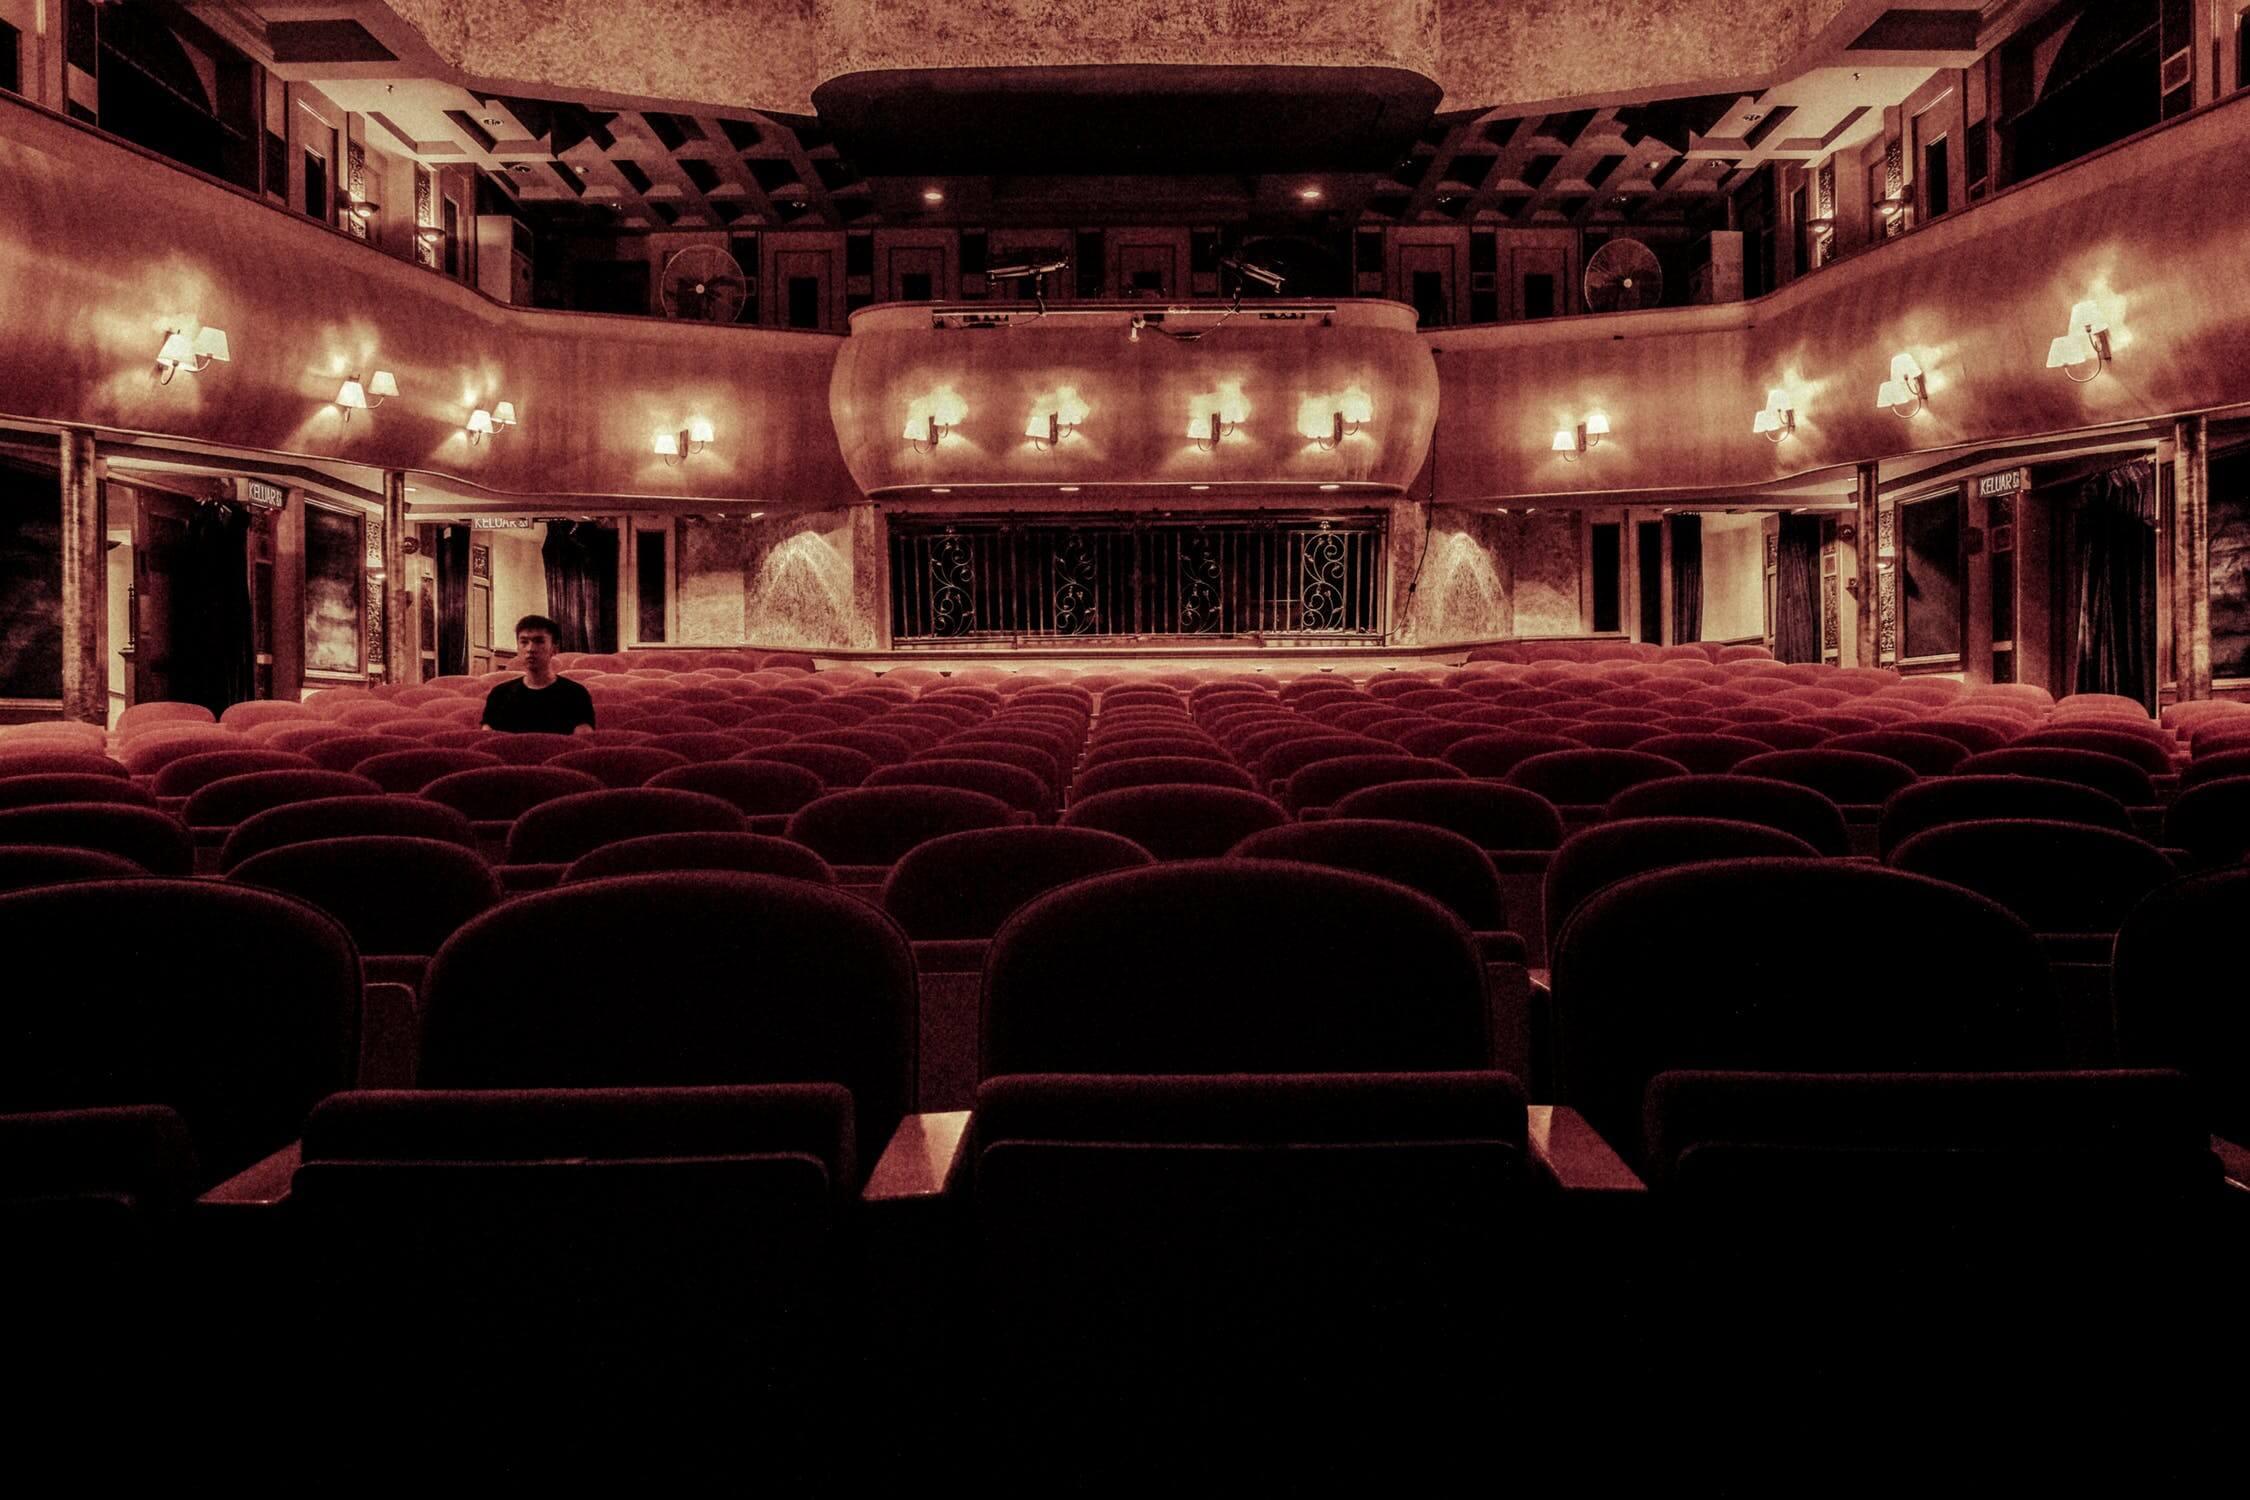 Voľné vstupenky do divadla